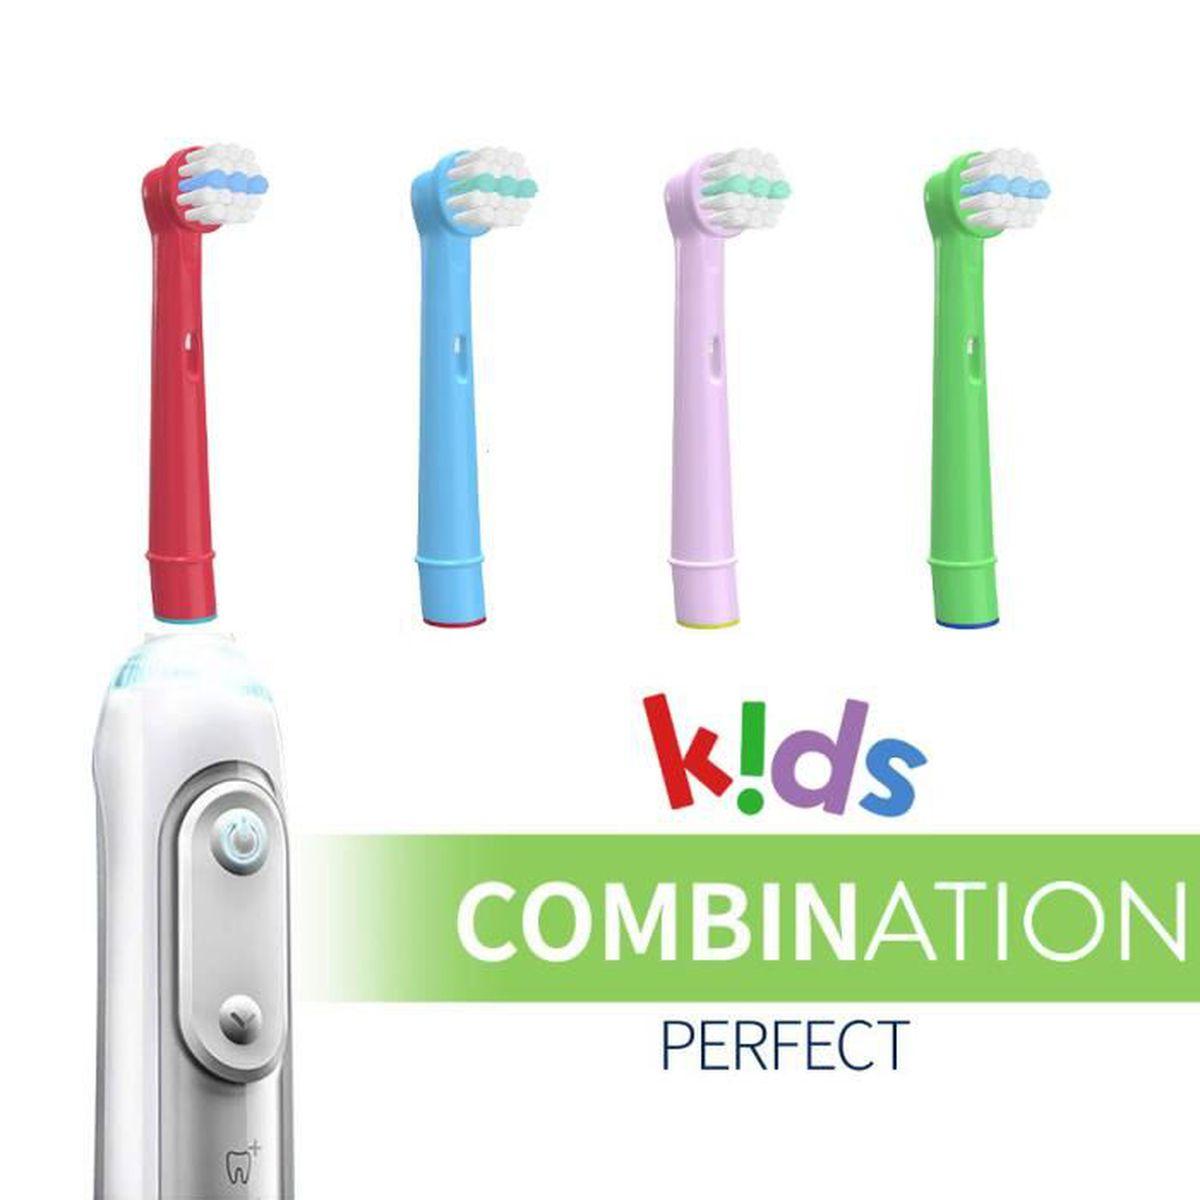 BROSSE A DENTS 4 Brossettes Enfant KiDs Compatibles - CANDORE® -